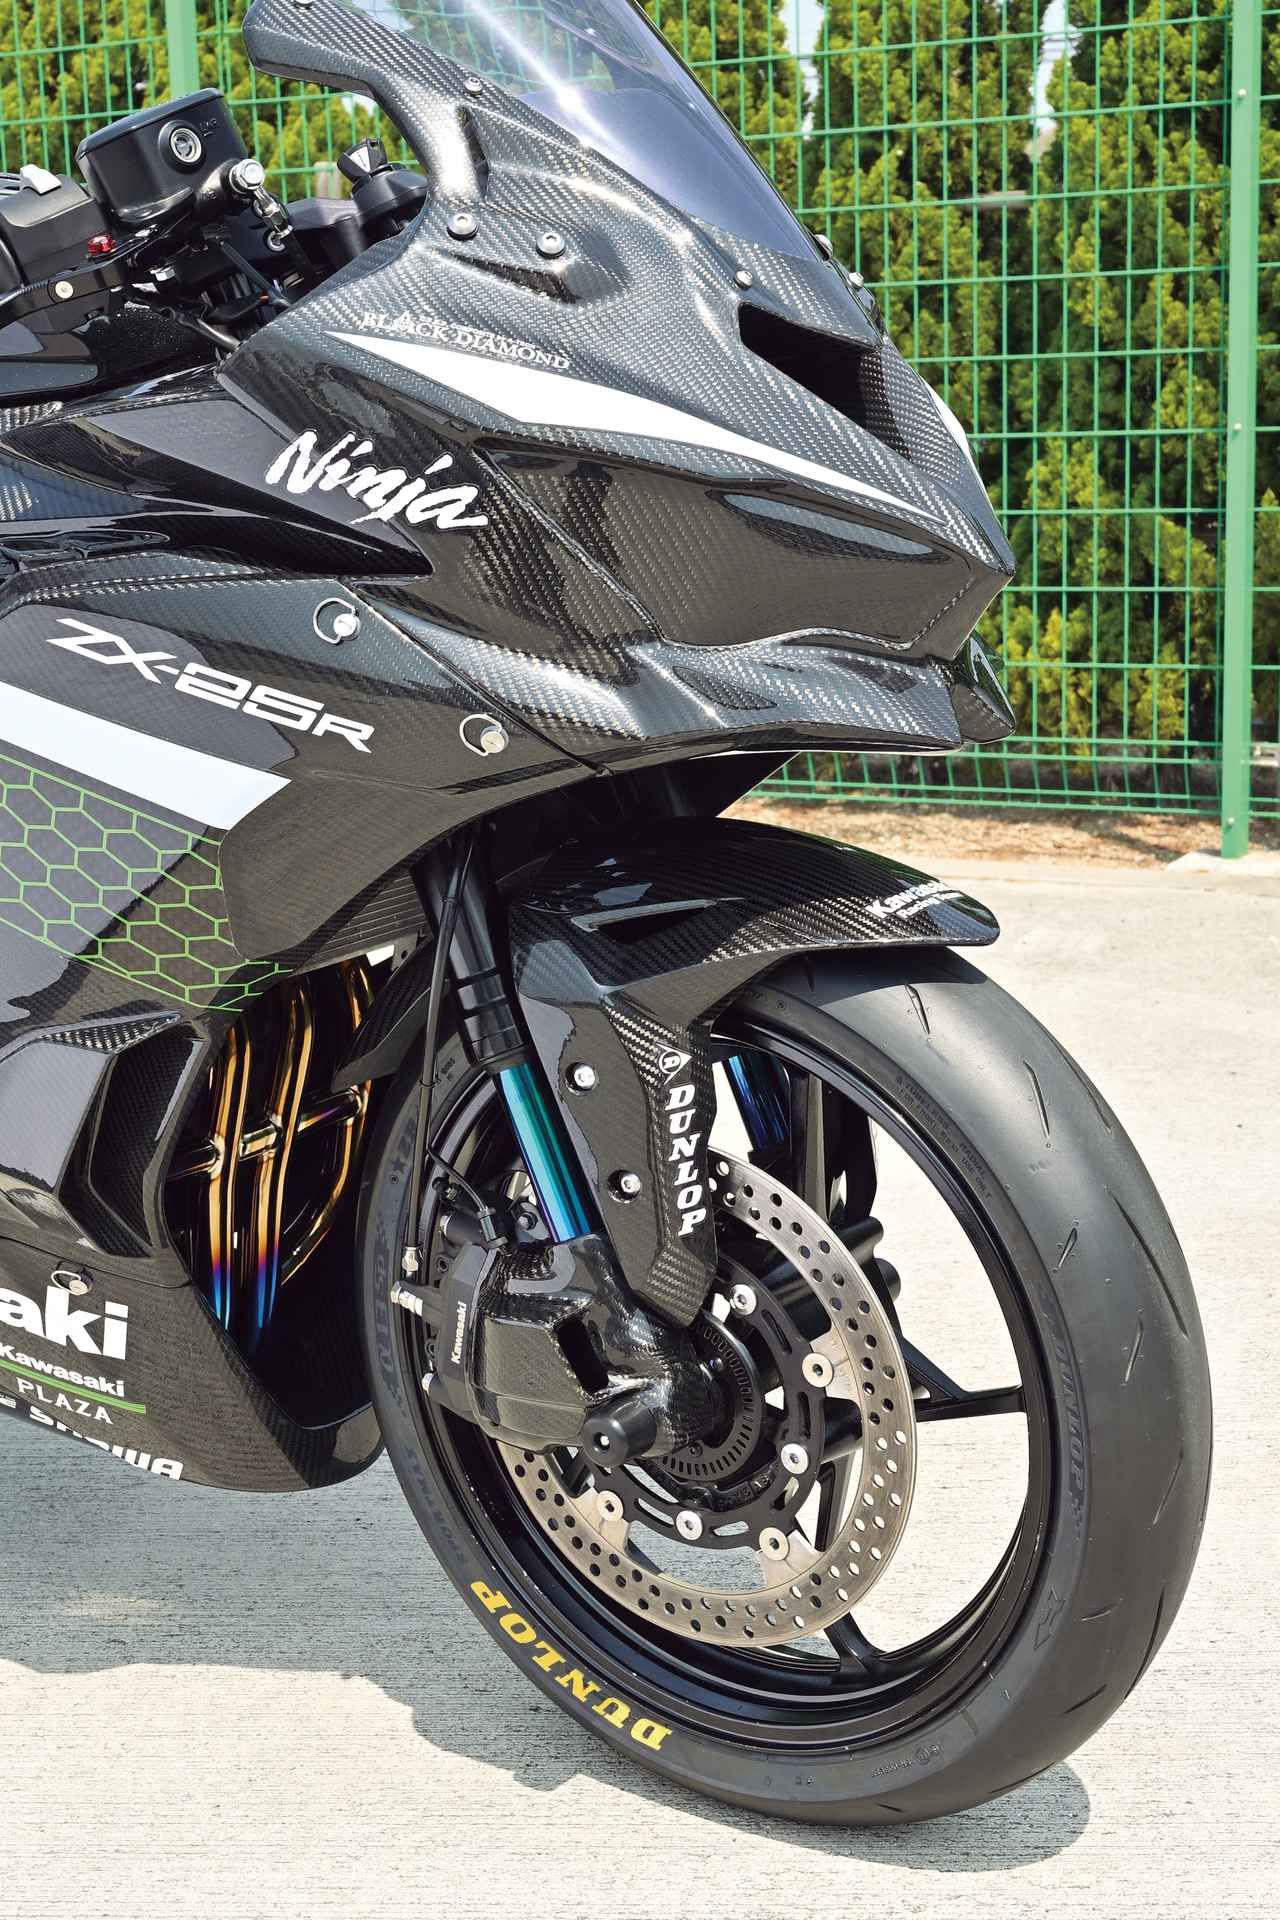 Images : 2番目の画像 - Kawasaki Ninja ZX-25R レースイメージカスタム車 - webオートバイ